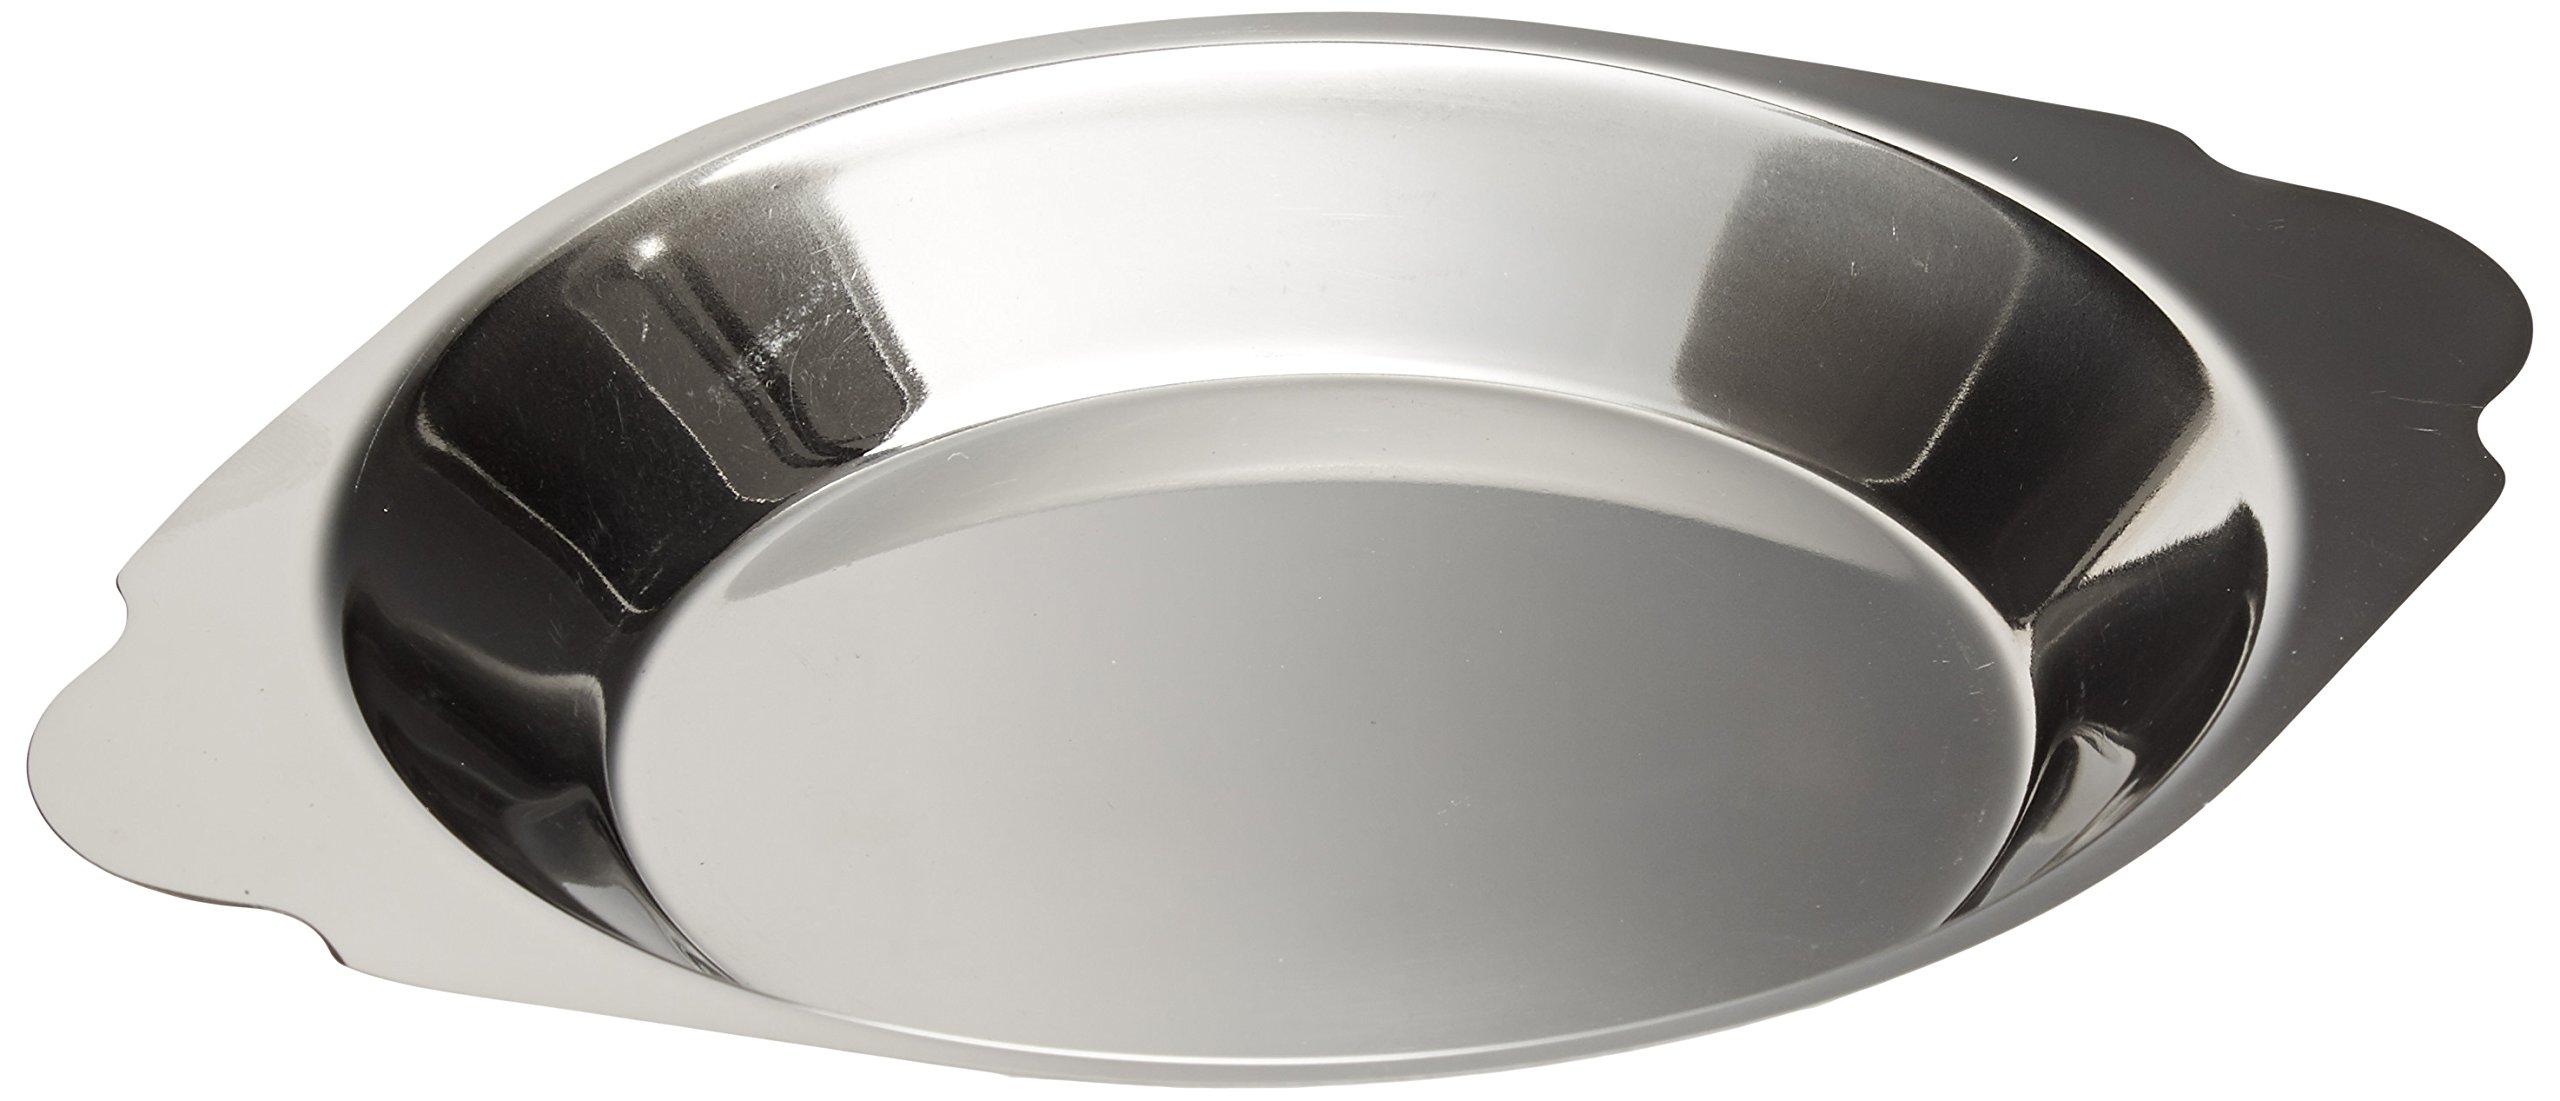 Royal Industries Round Au Gratin, Stainless Steel, 10 oz, Silver